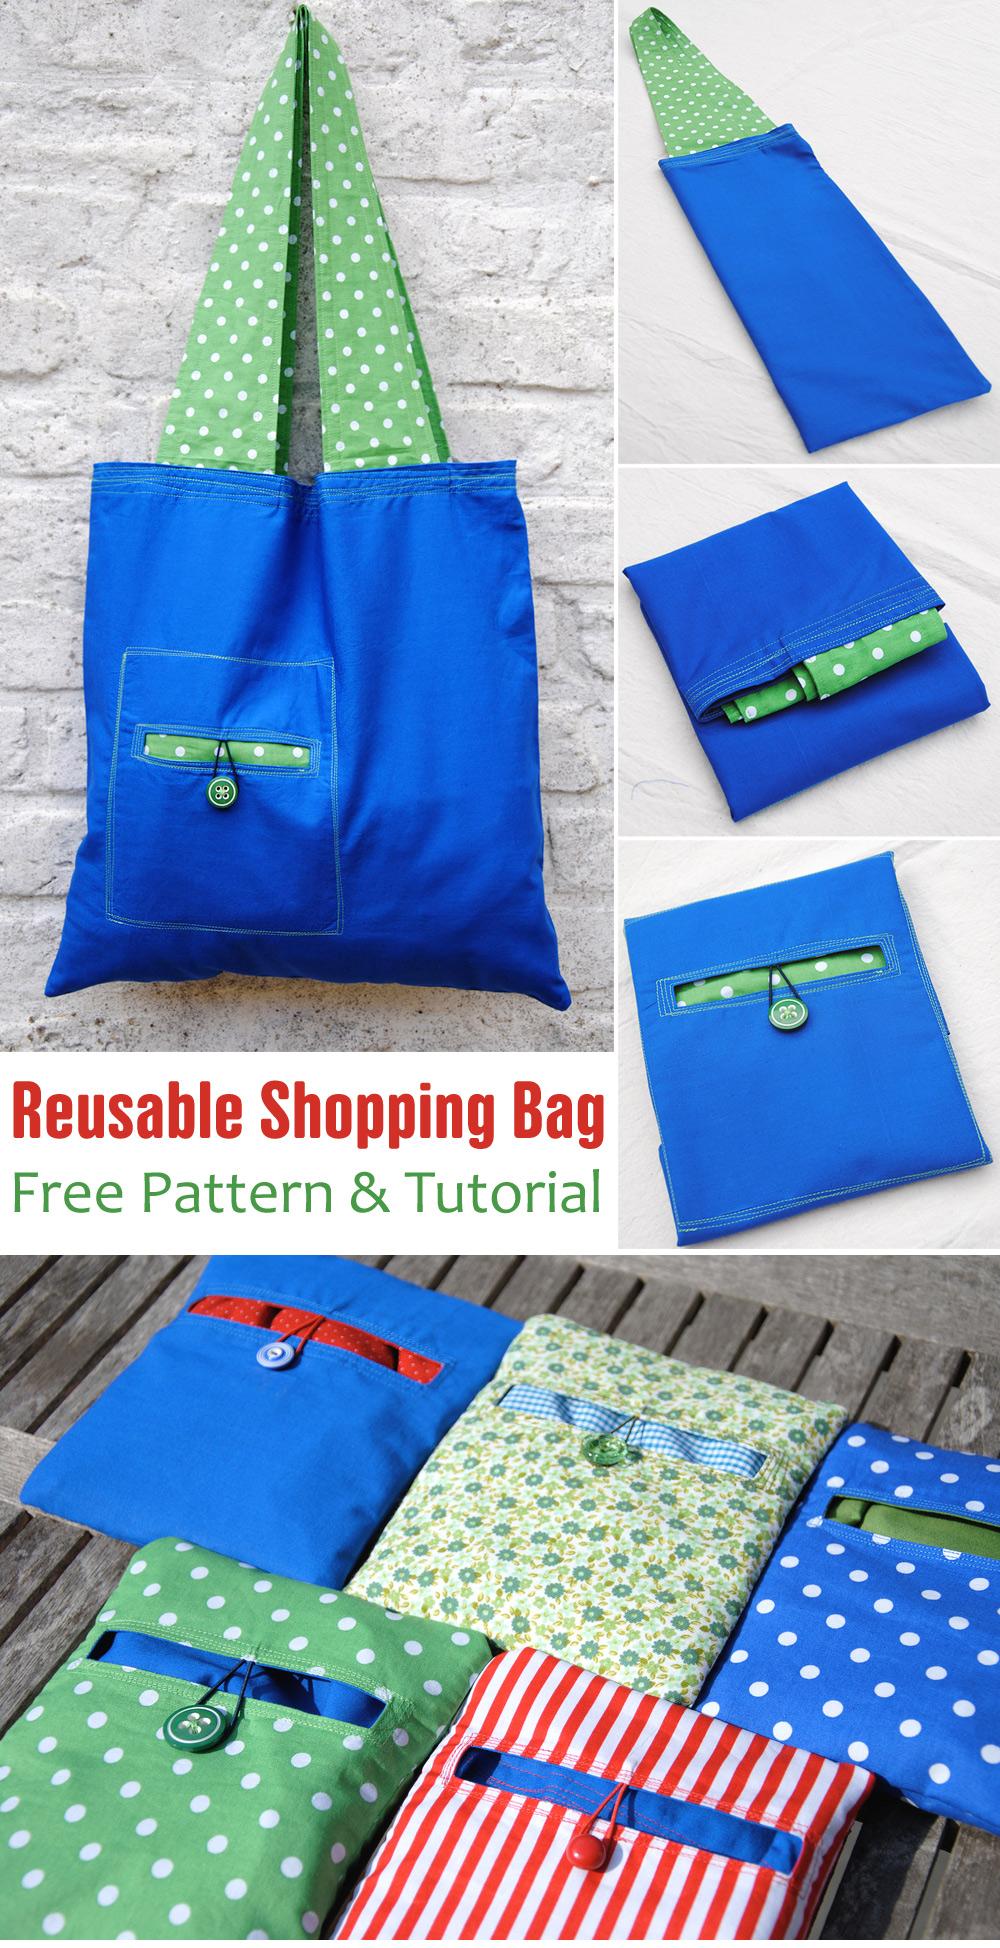 Reusable Shopping Bag Pattern & Tutorial